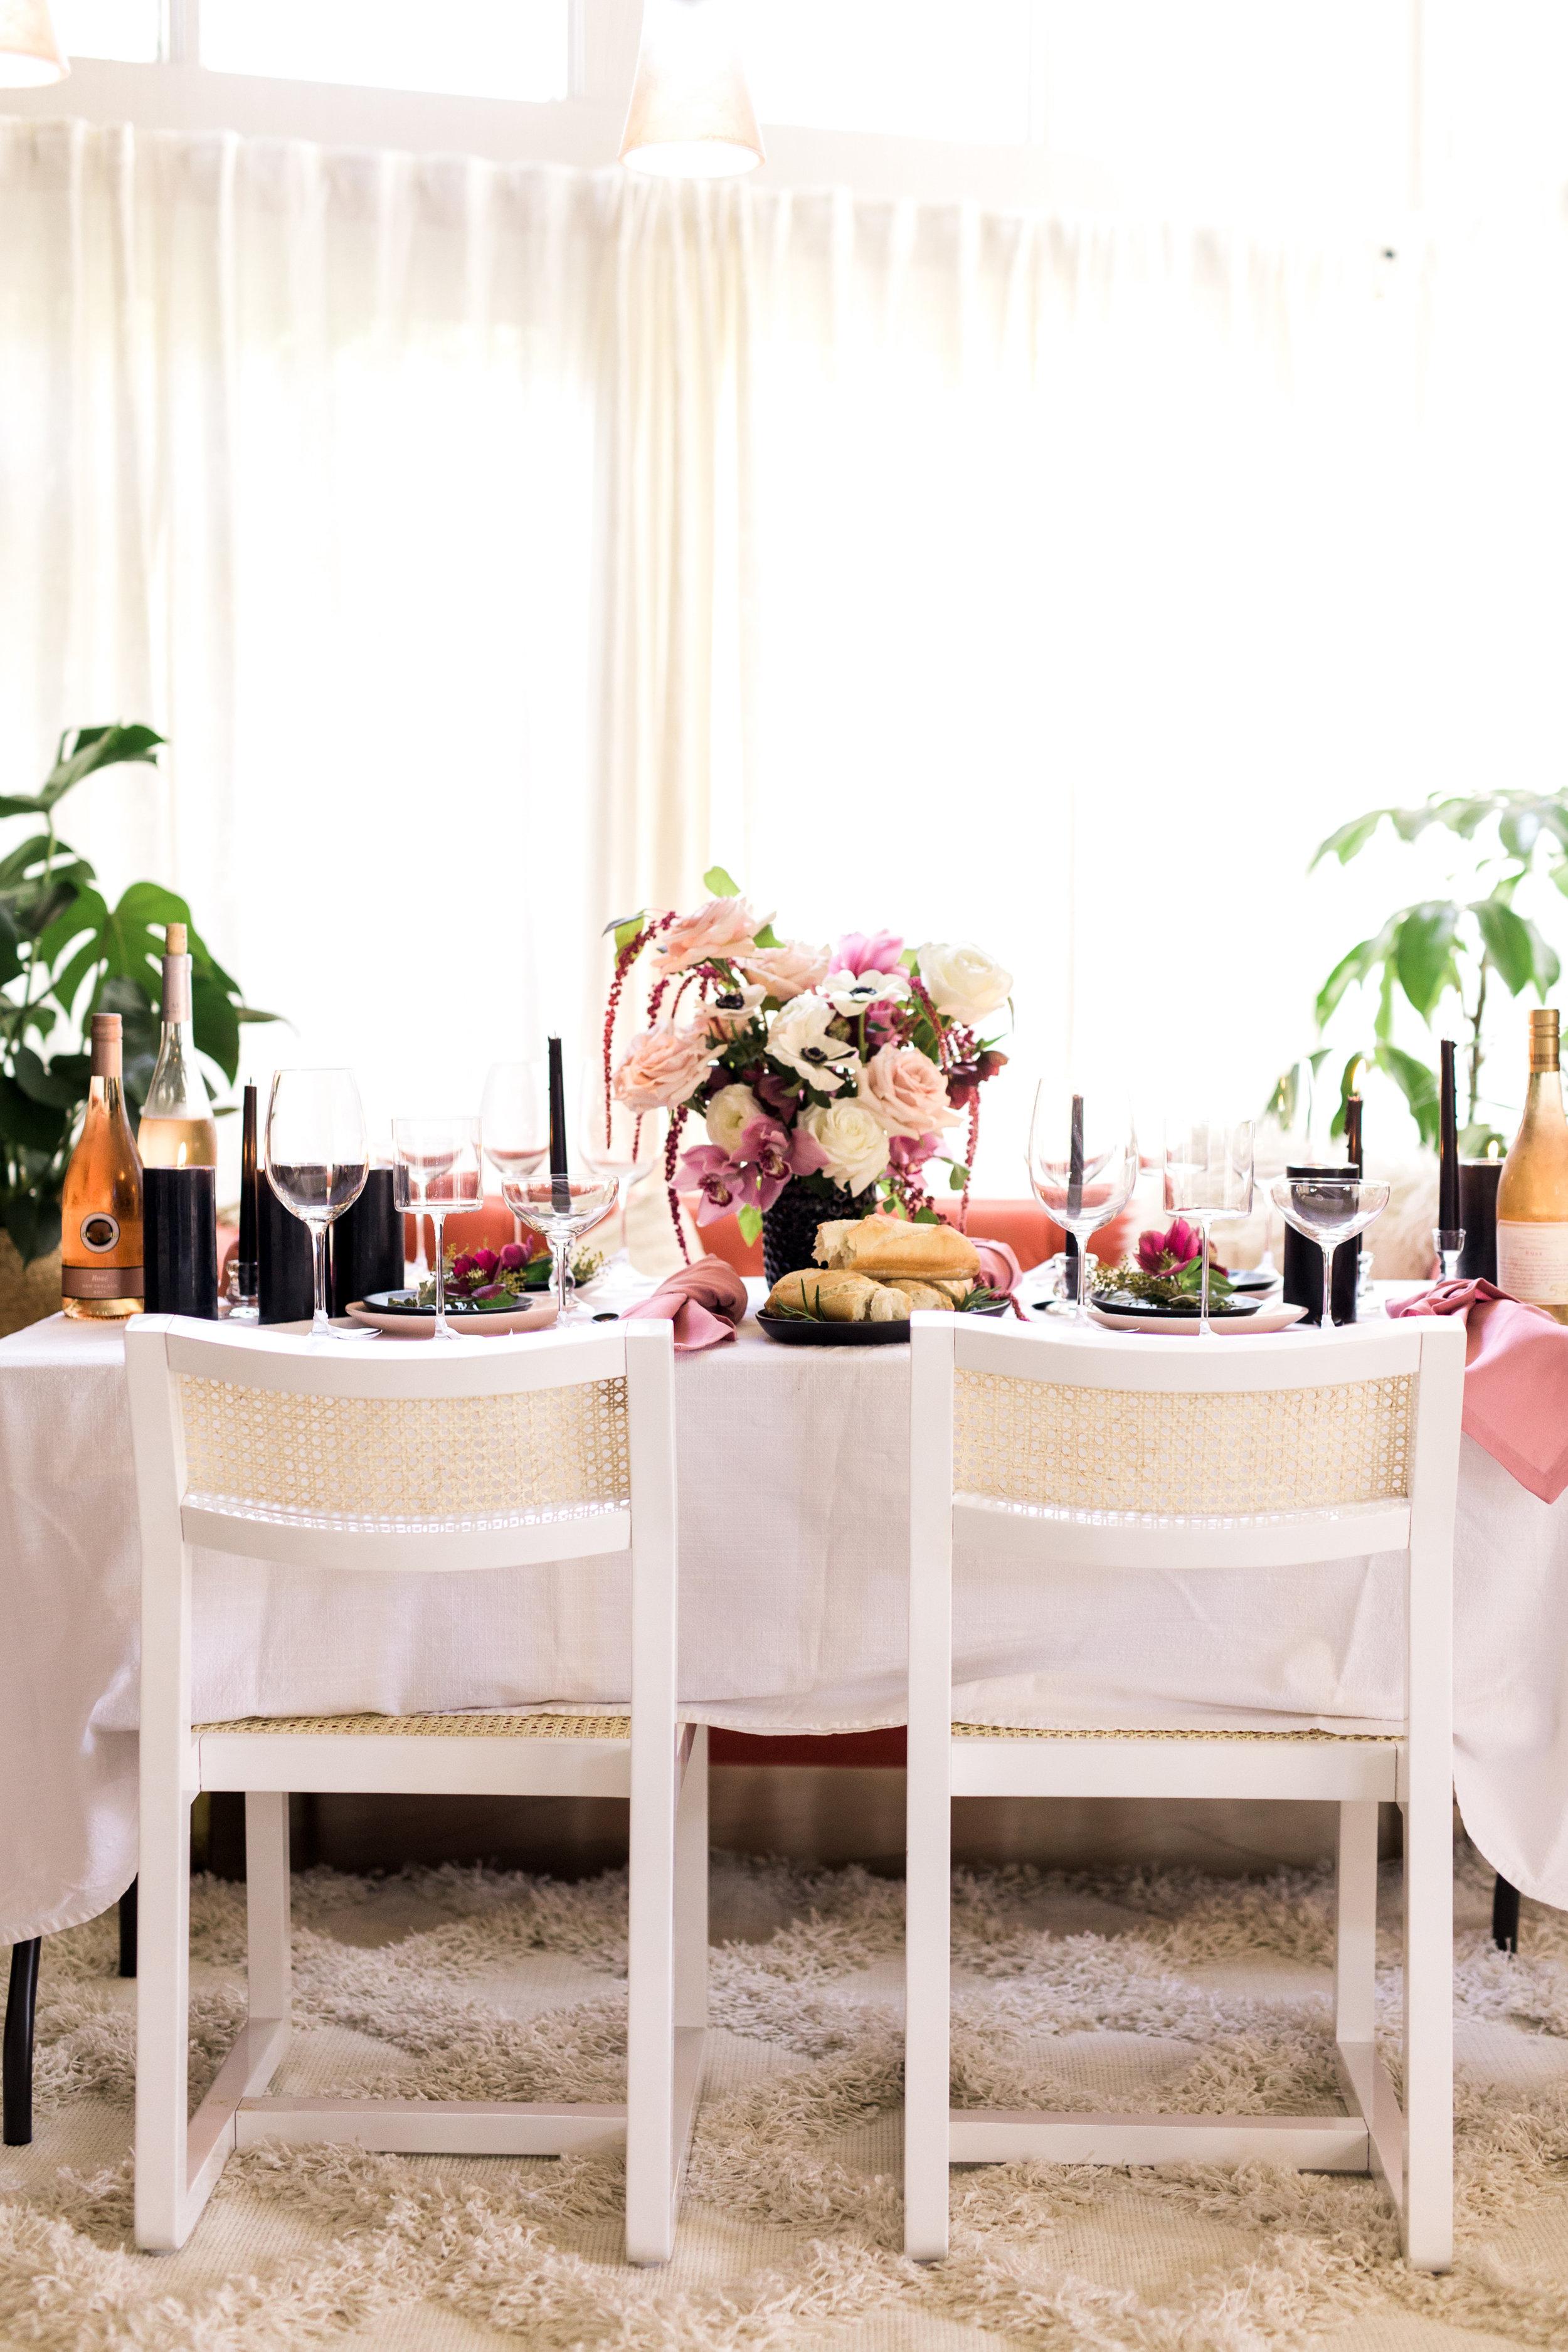 DIY Rose Tasting | A Fabulous Fete